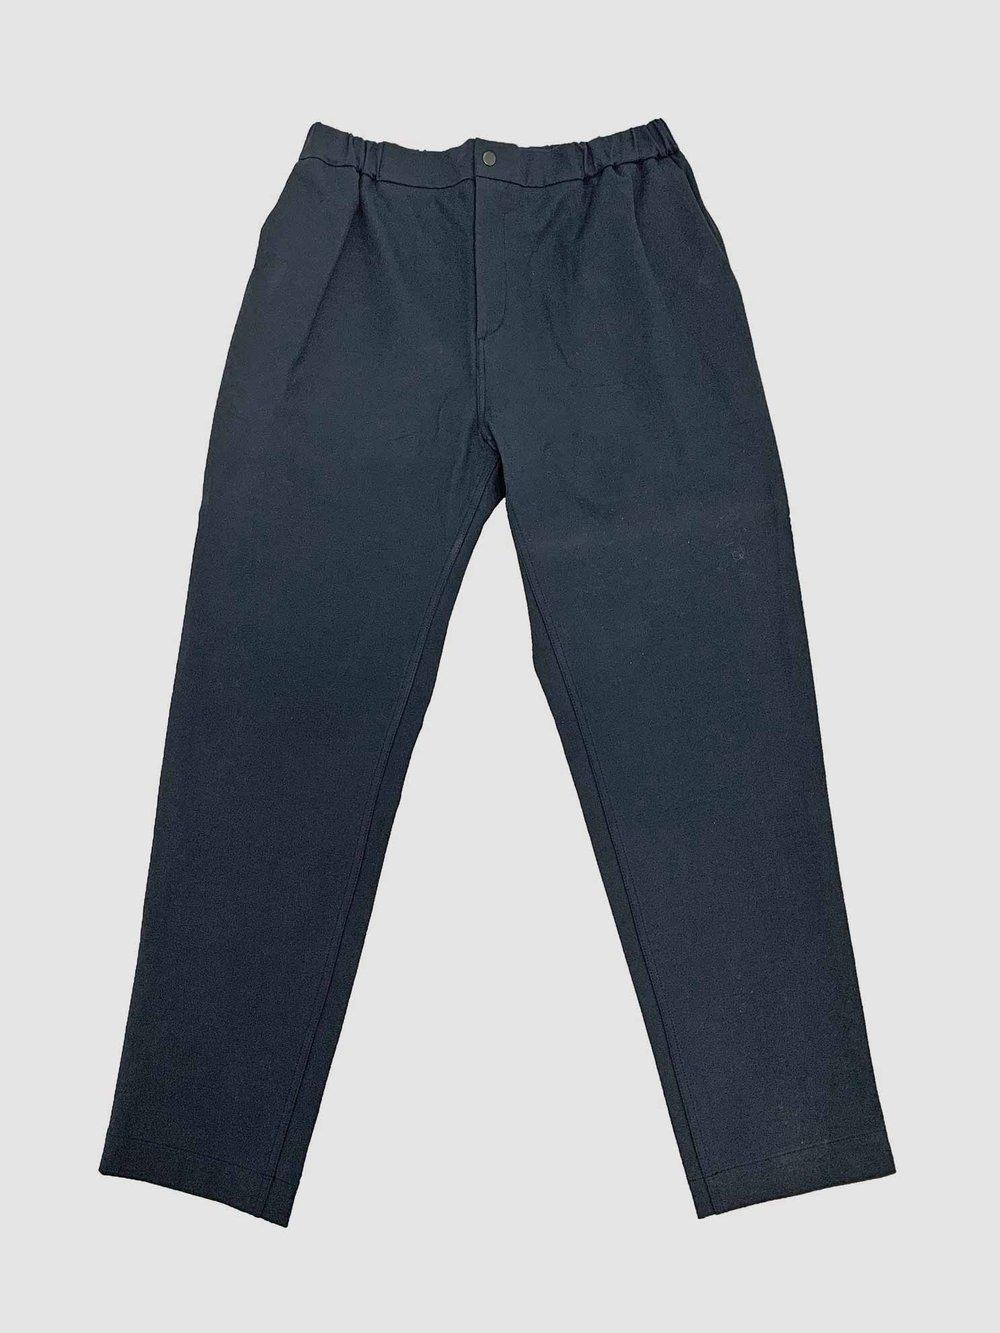 Image of Maja Brix & Aarstiderne - Trousers - Black Cotton